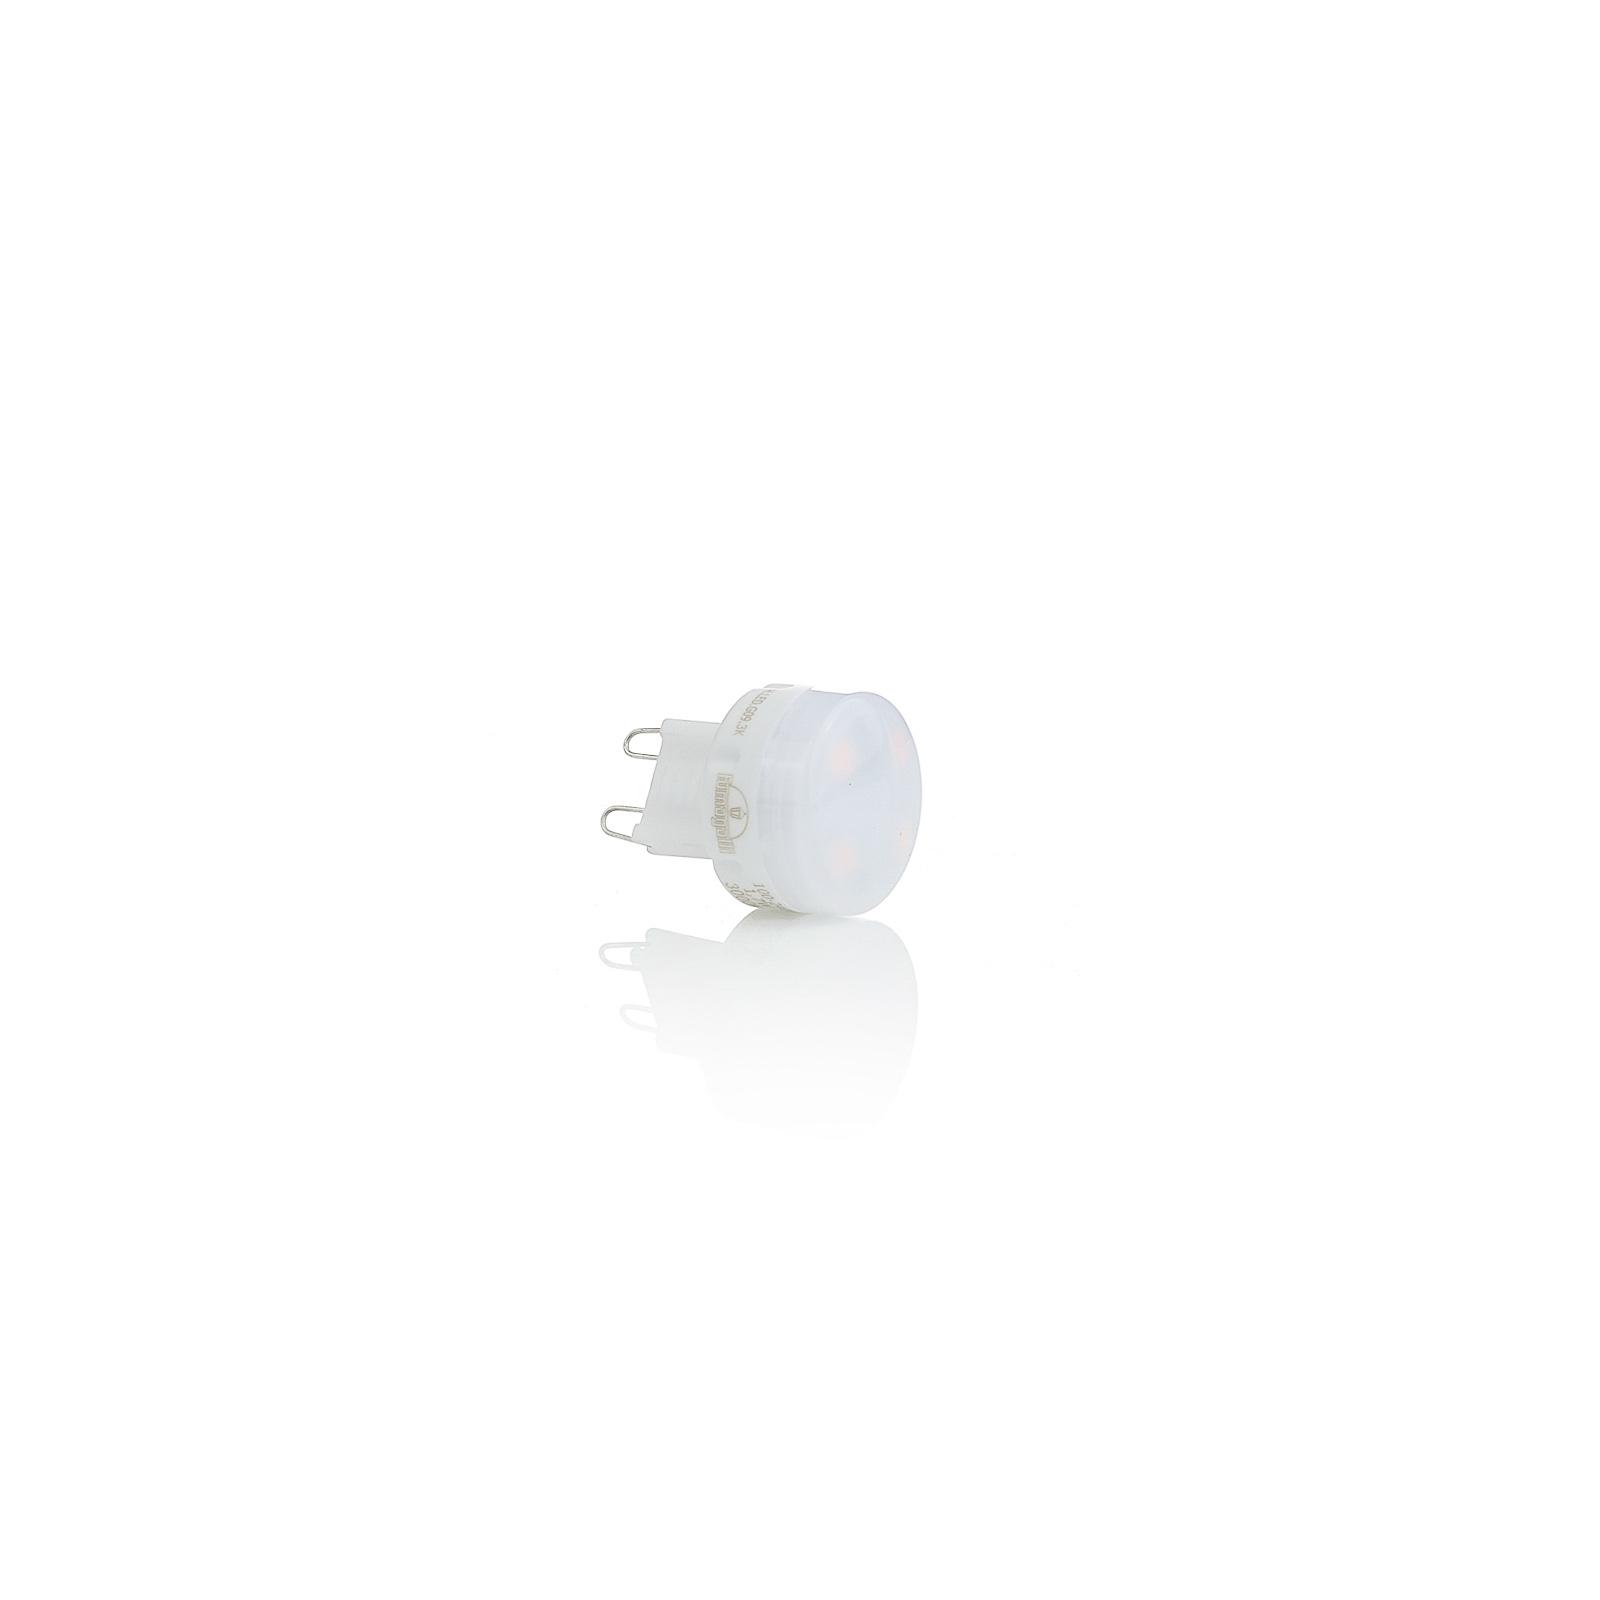 LED-Lampe G9, 1,7 W, 170 lm, 3.000 K